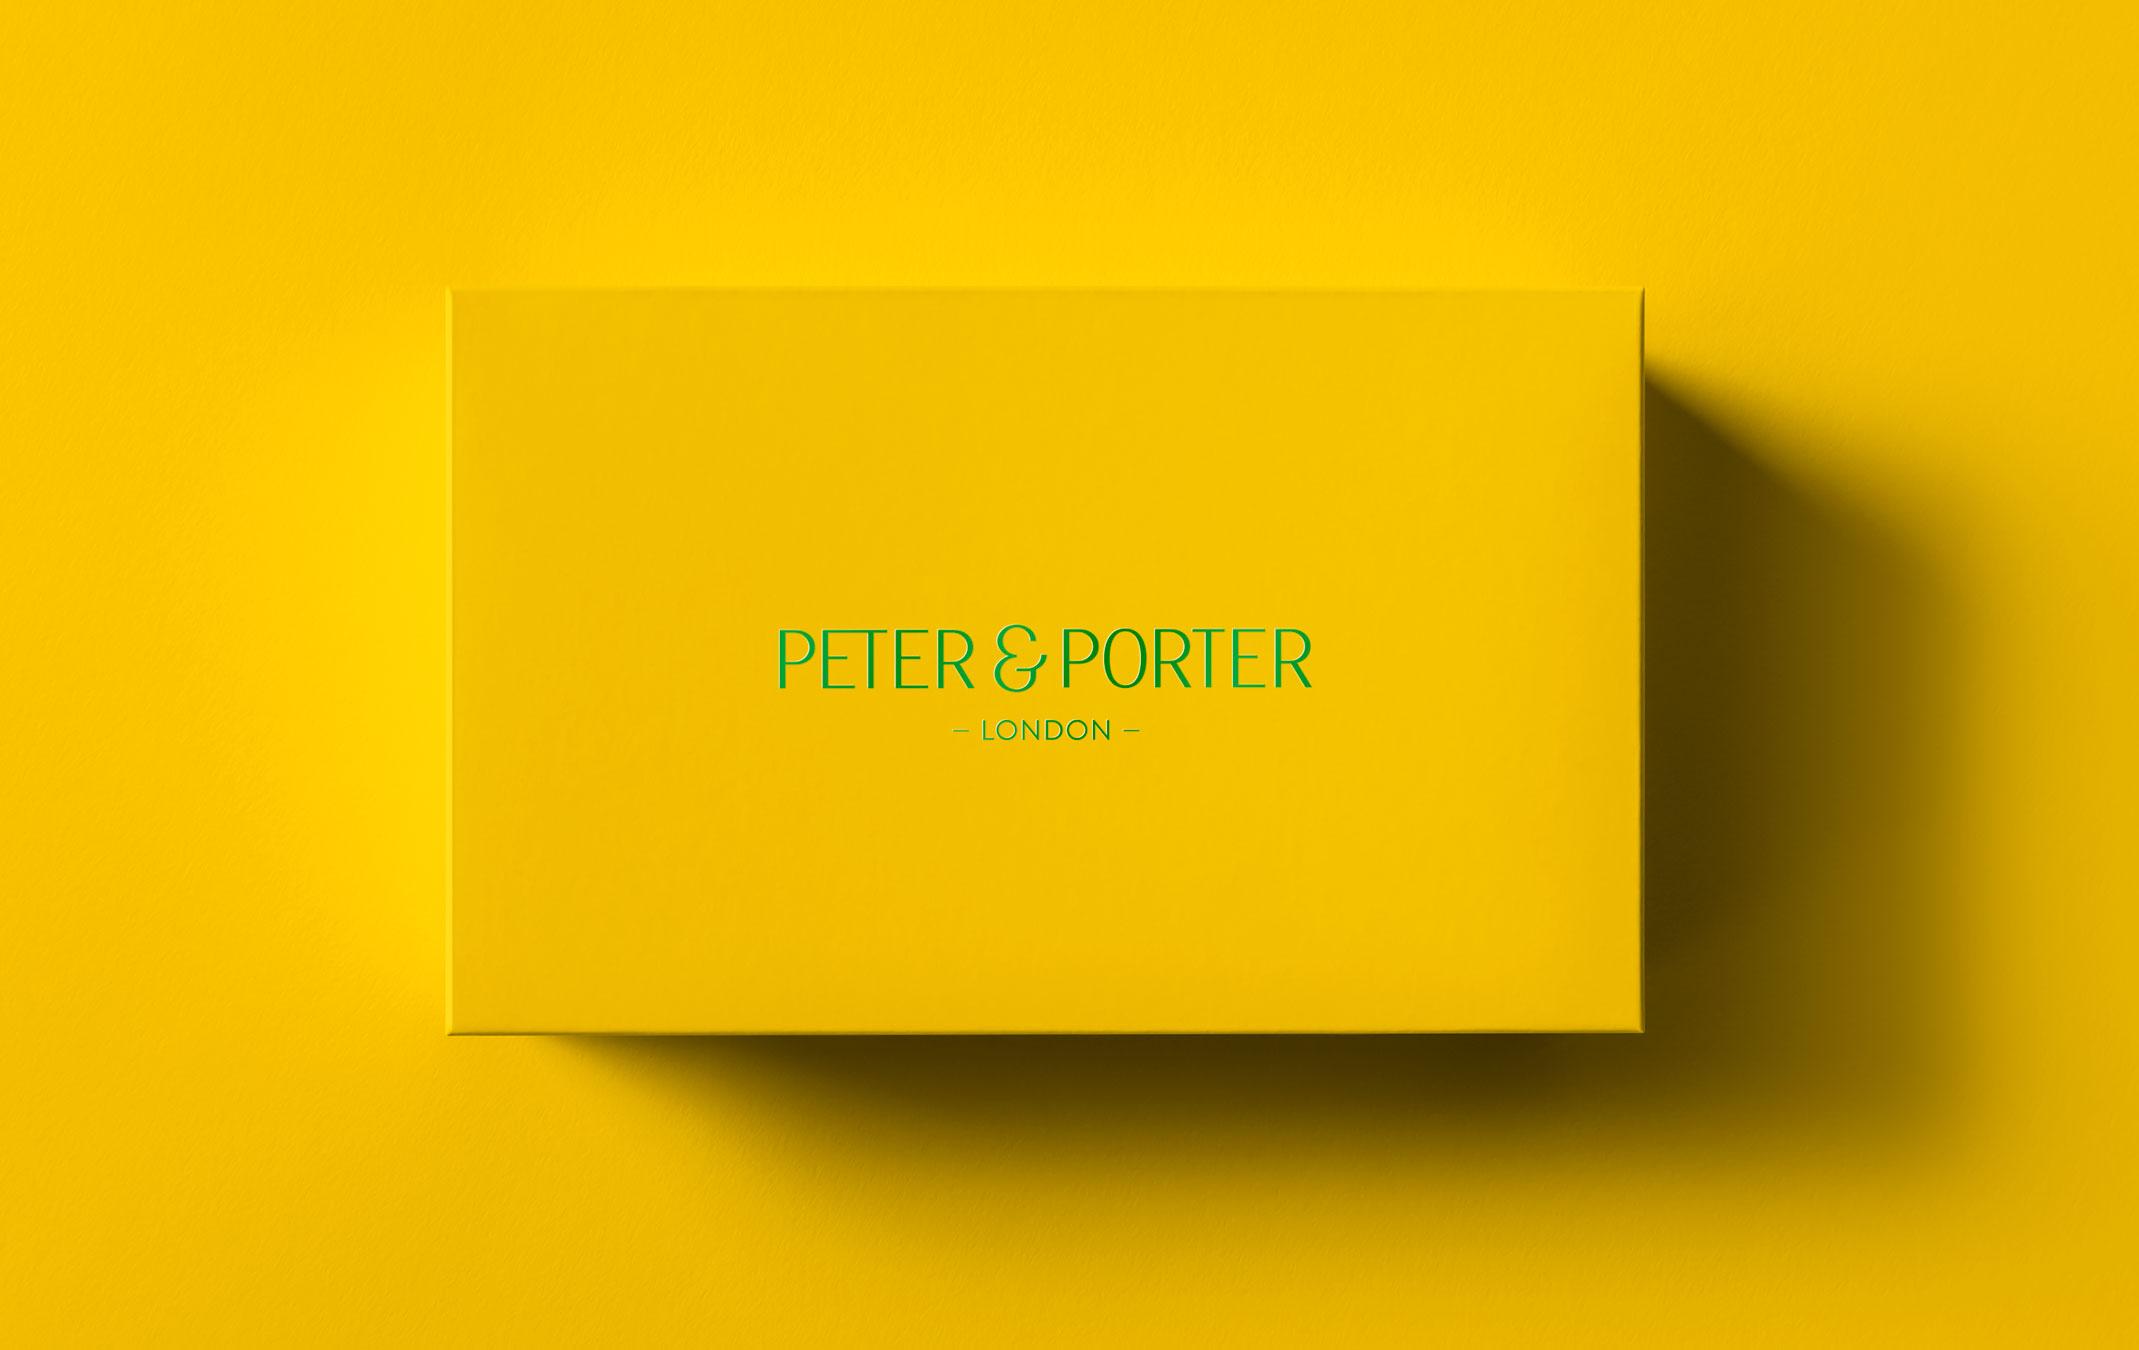 Peter & Porter. London